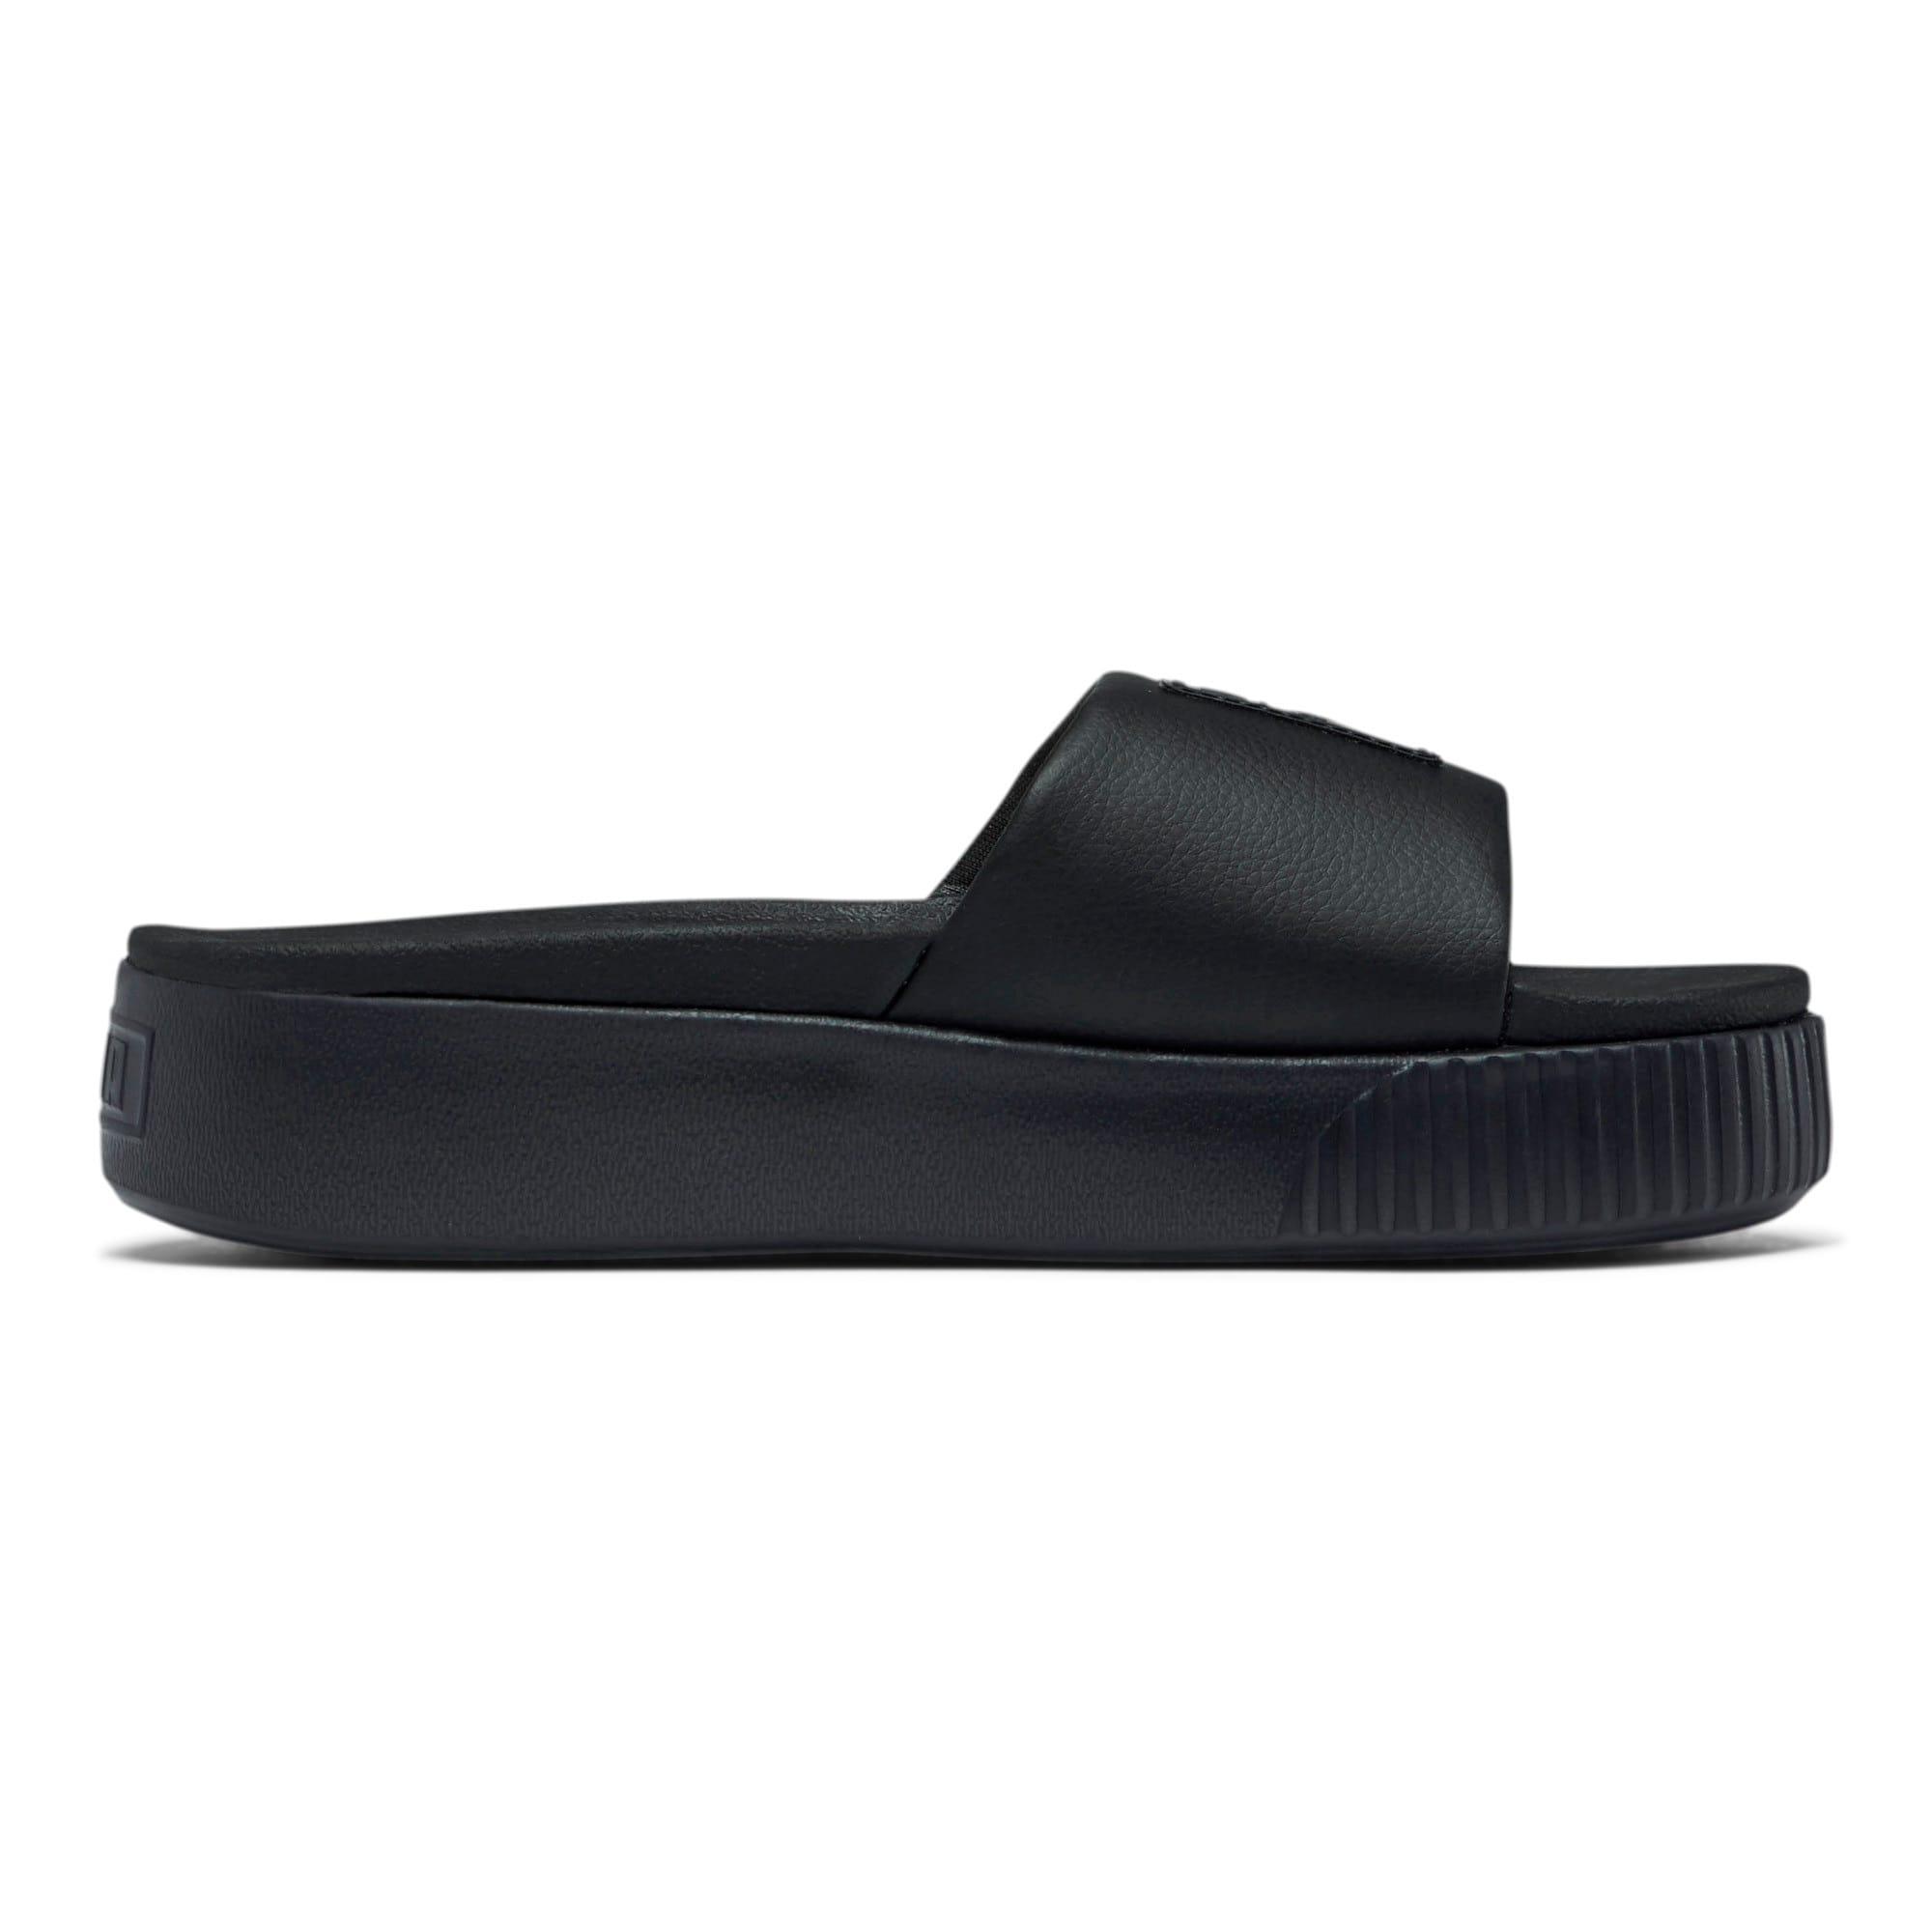 Thumbnail 5 of Platform Slide Women's Sandals, Puma Black-Puma Black, medium